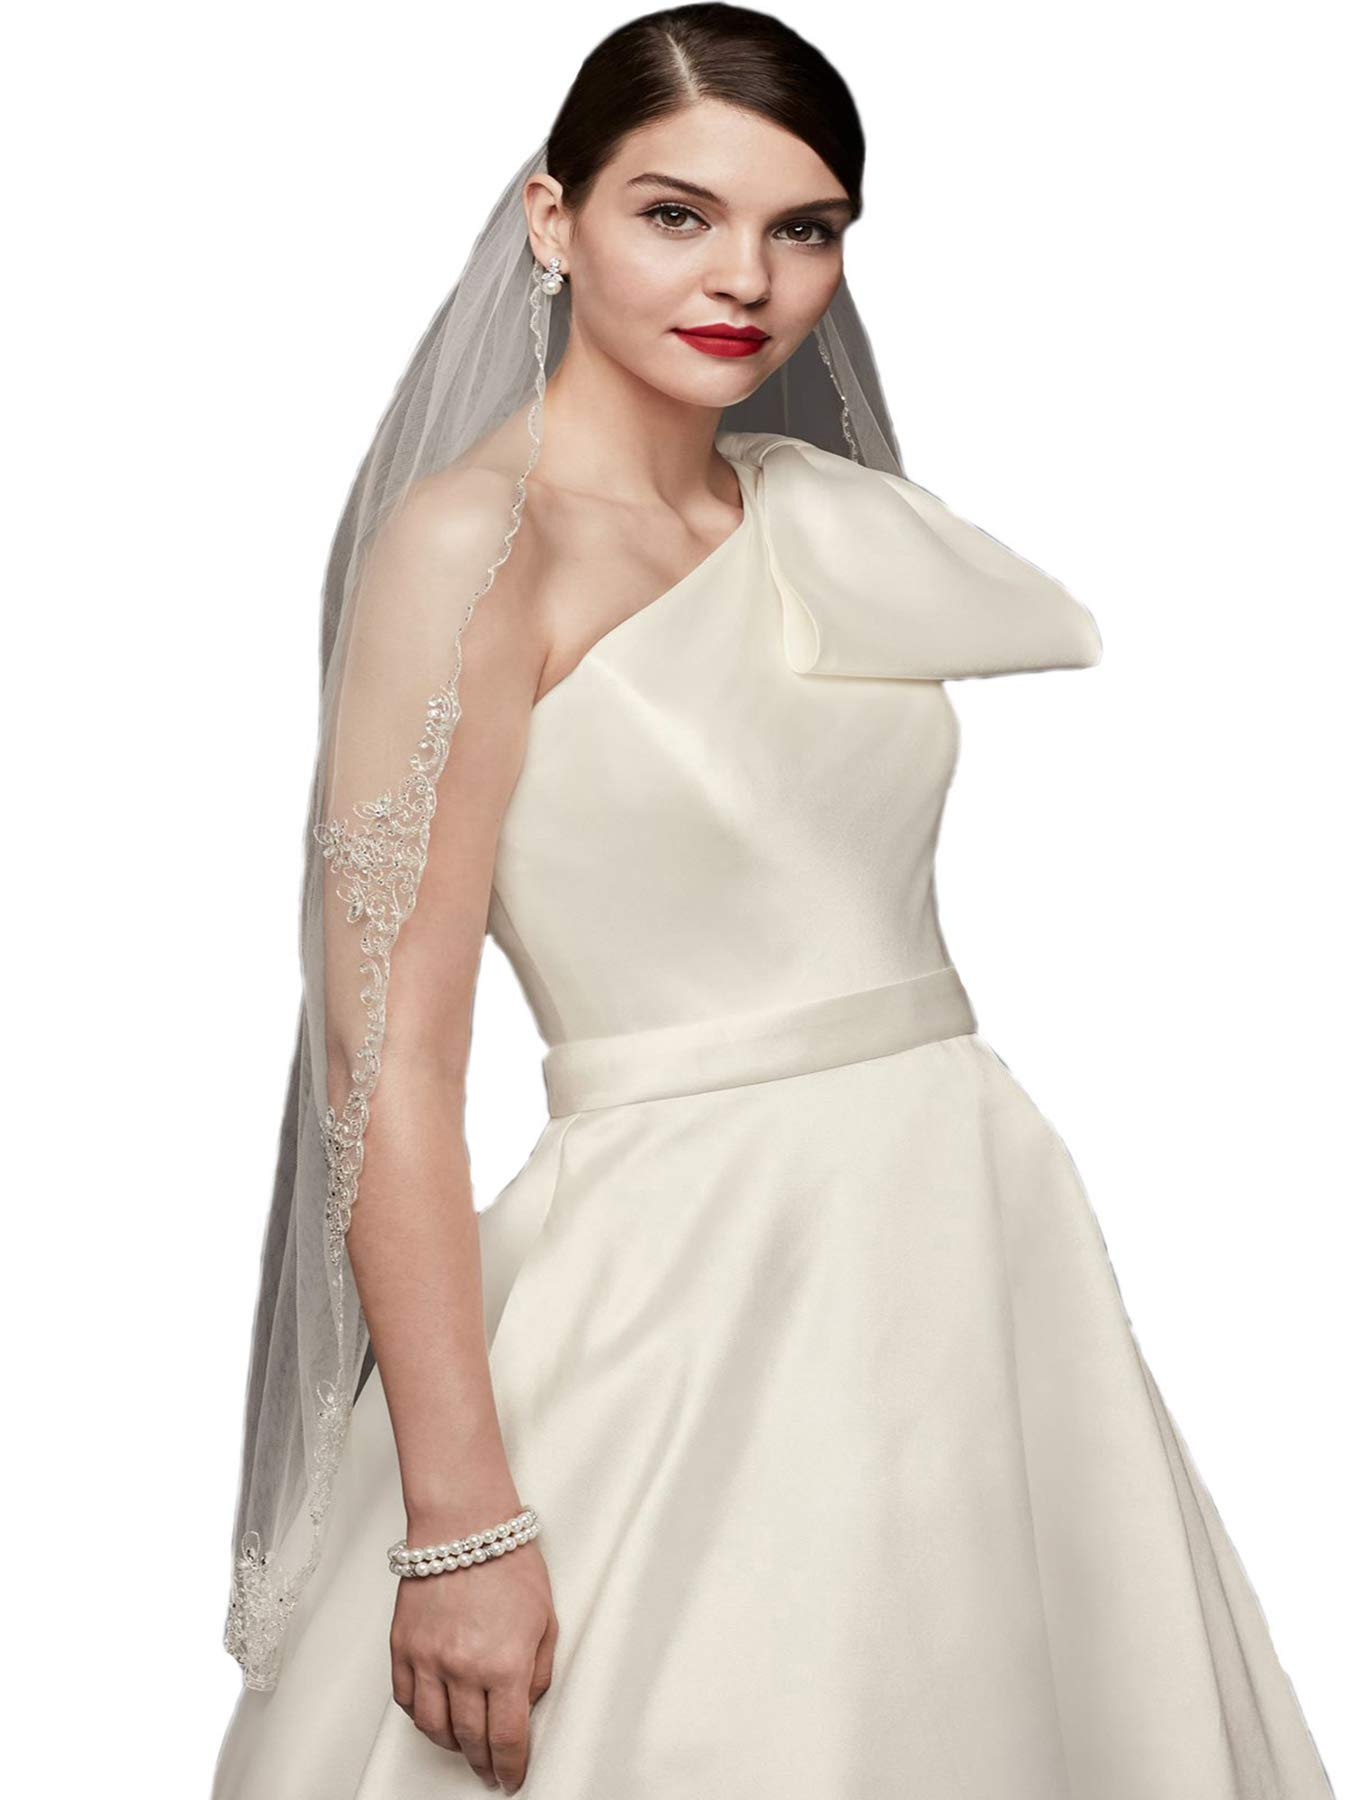 Passat Ivory 1T Ballet/Tea 1T Metallic Embroidered scalloped crystal veil bridal veil rhinestones DB121 by Passat